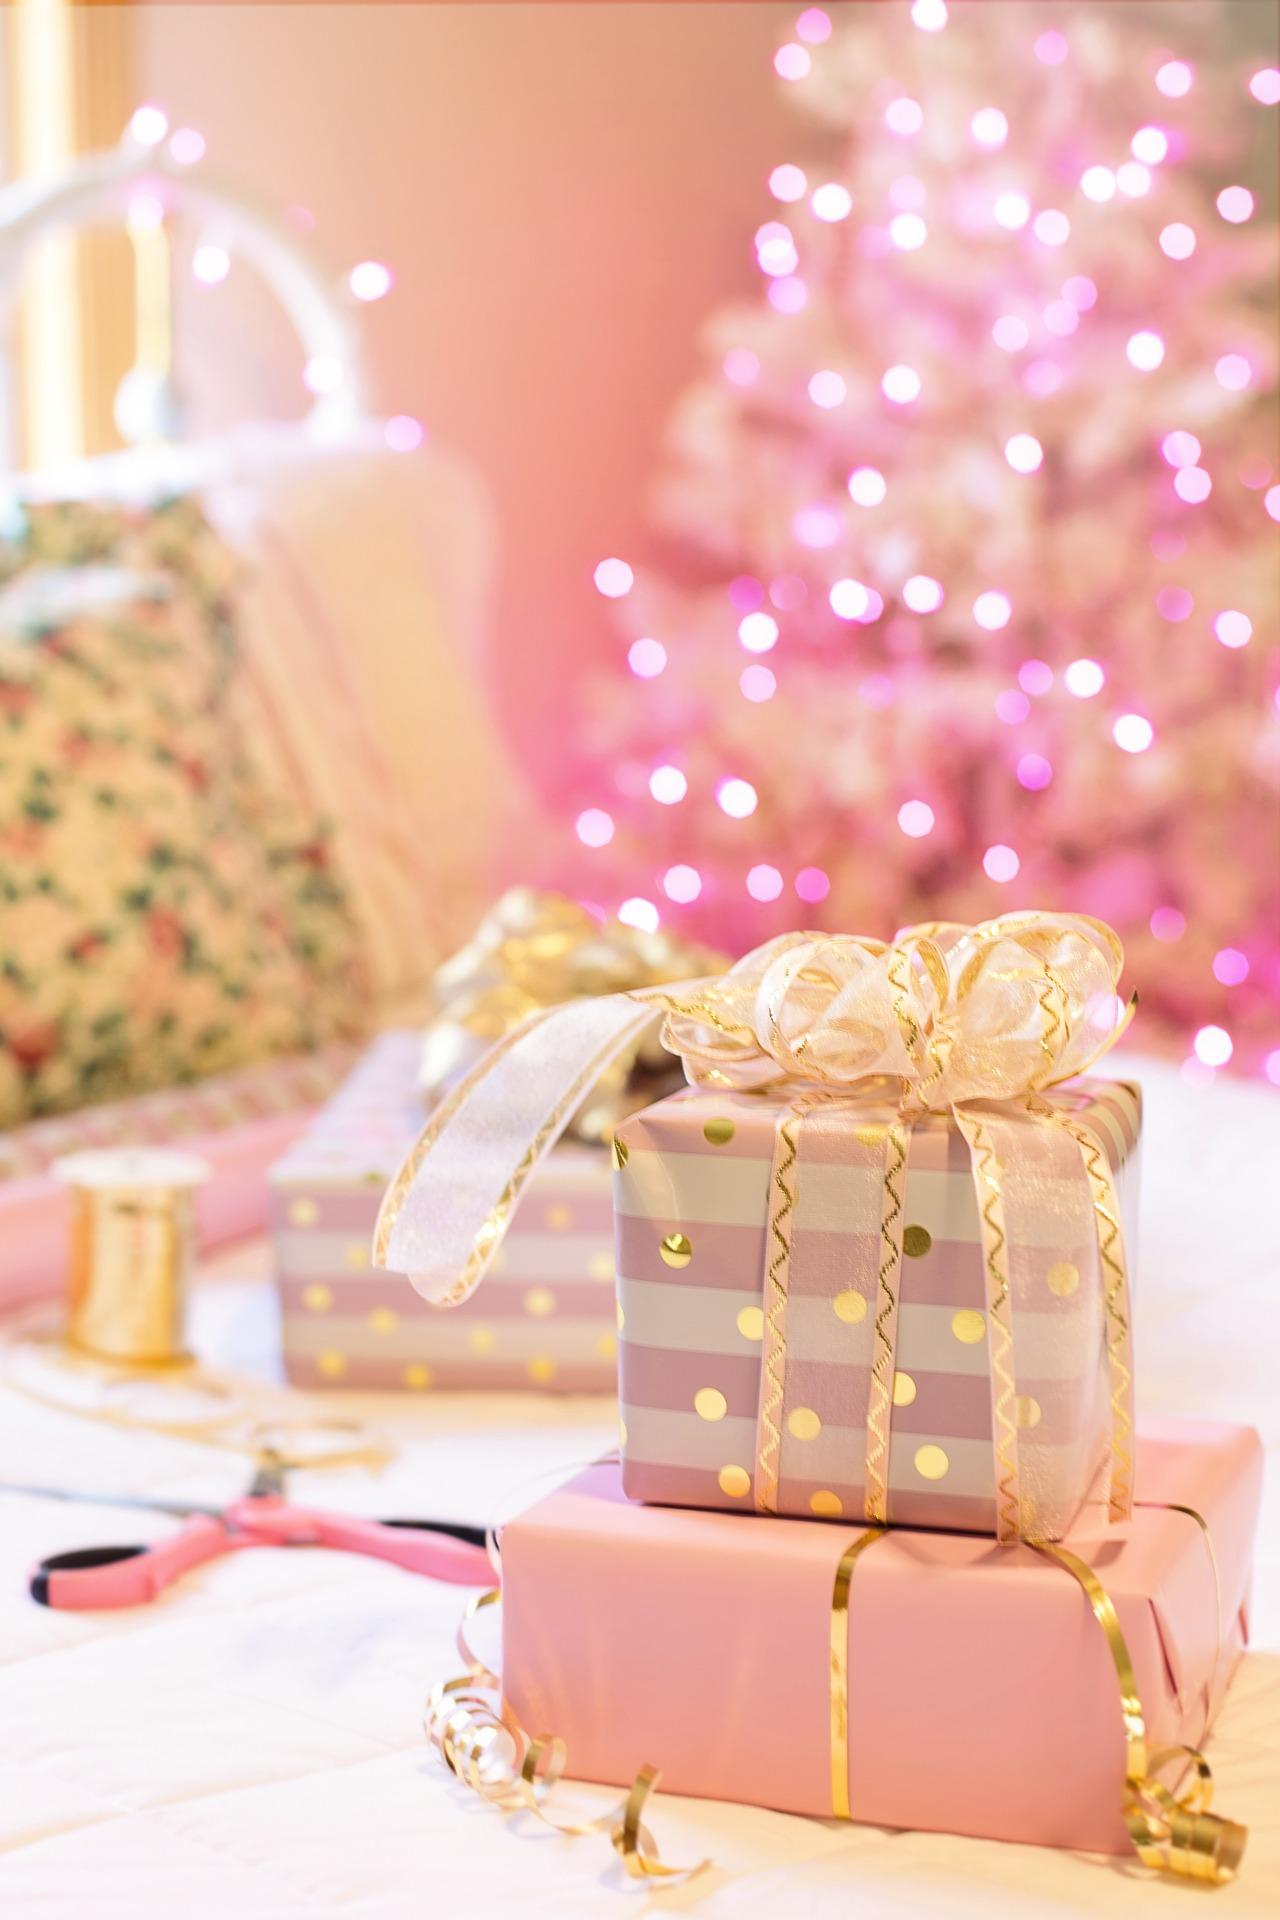 Organizational Hacks for the Holiday Season